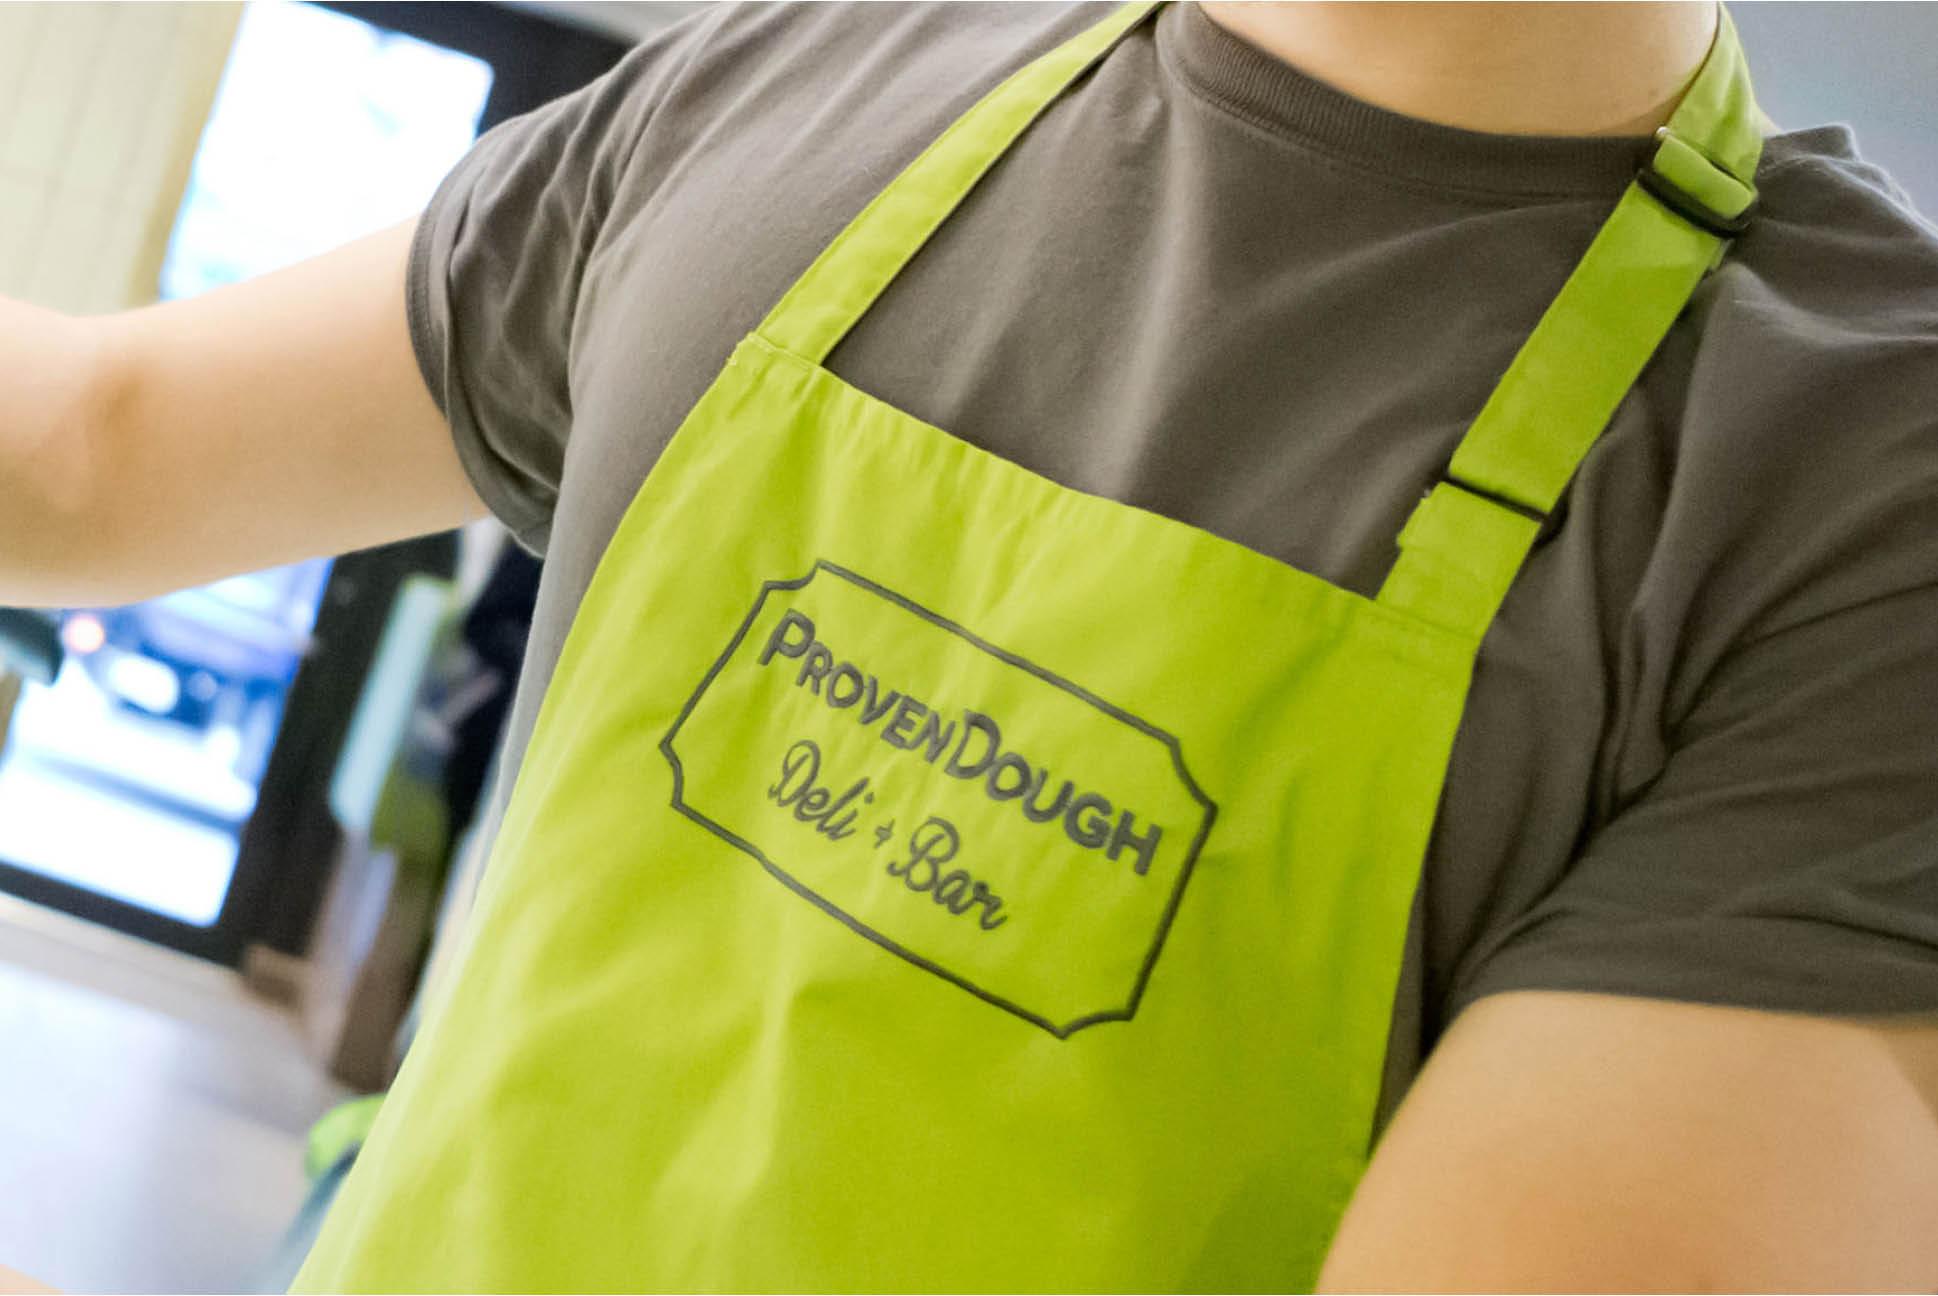 ProvenDough Uniform   Branding and Identity Design - Independent Marketing   IM London